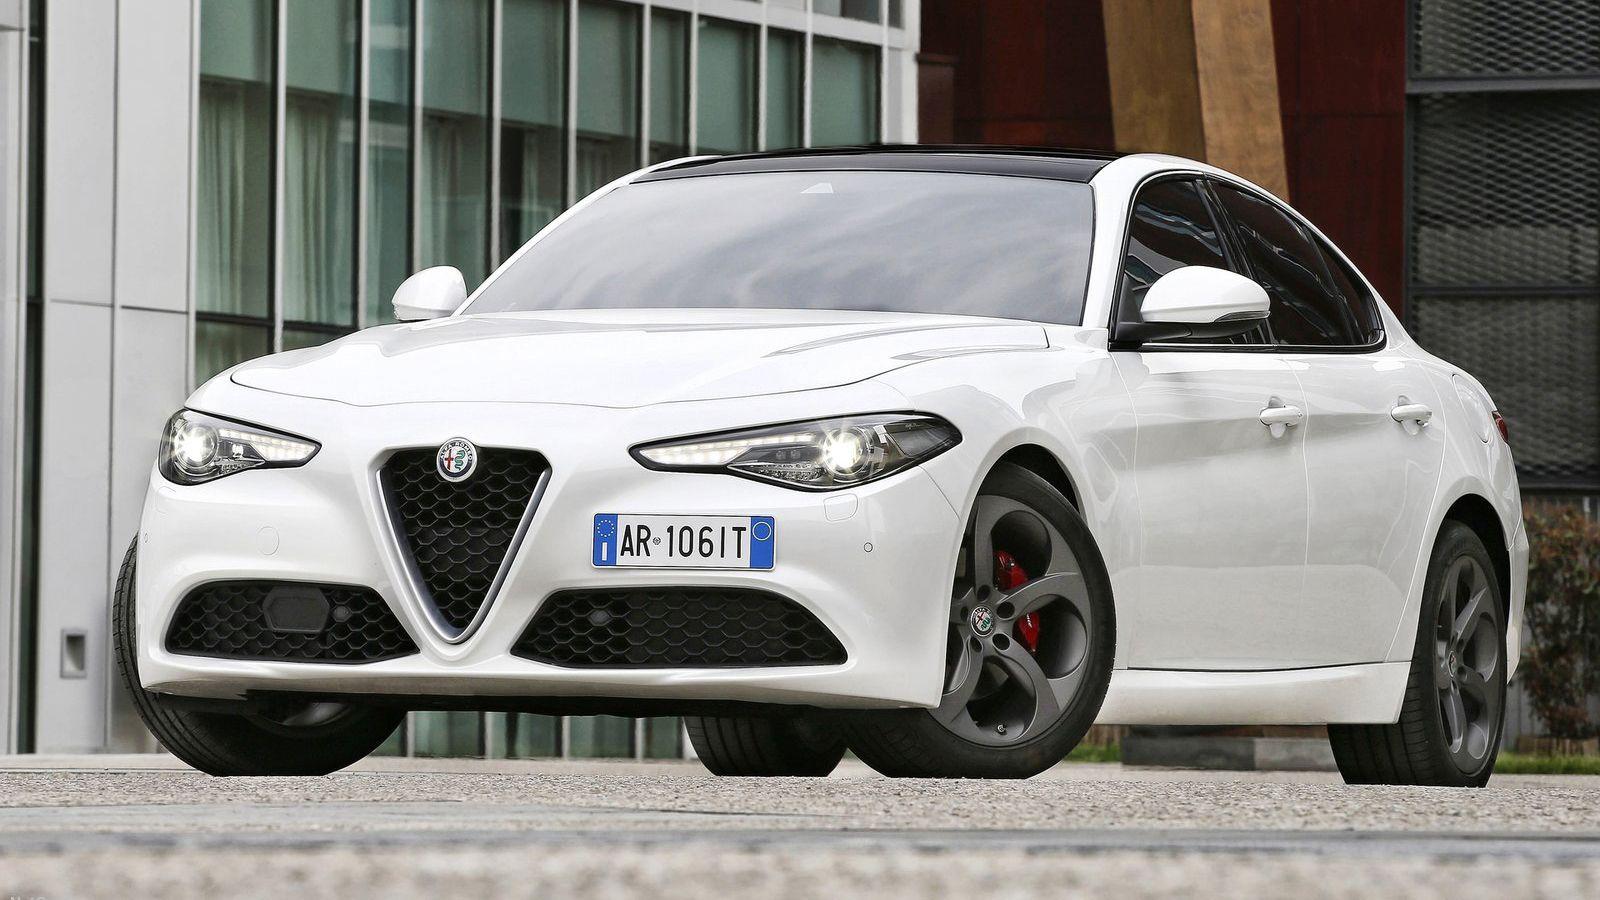 355ca4dffb Το νέο σεντάν της Alfa Romeo θα έχει μοτέρ 1